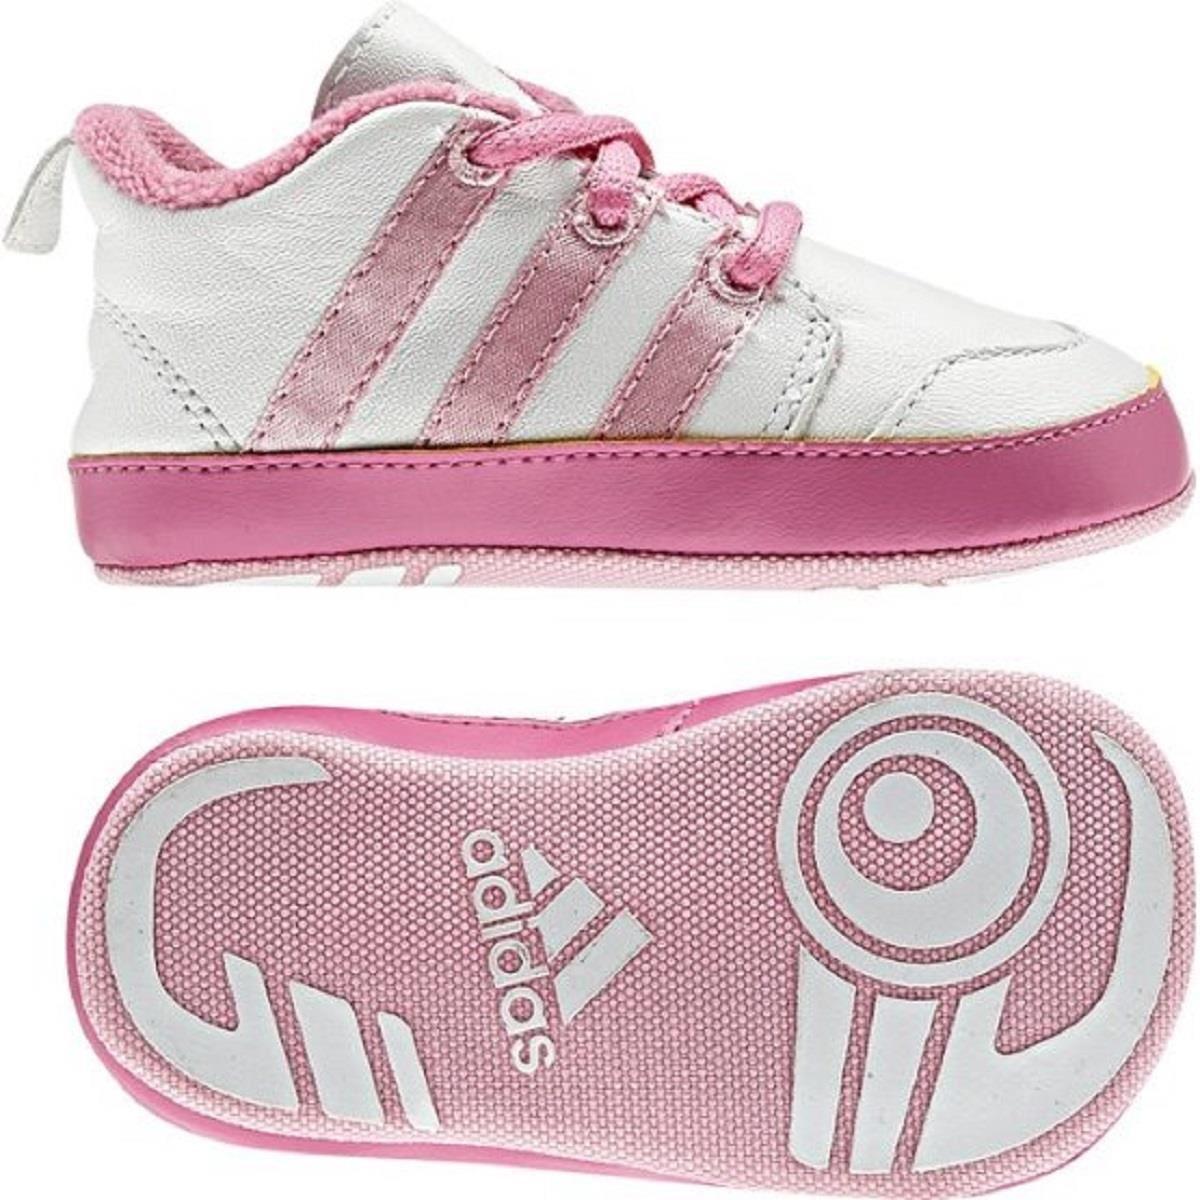 Enfants ADIDAS Liladi 3 Crib Baskets blanc/rose (G46306)